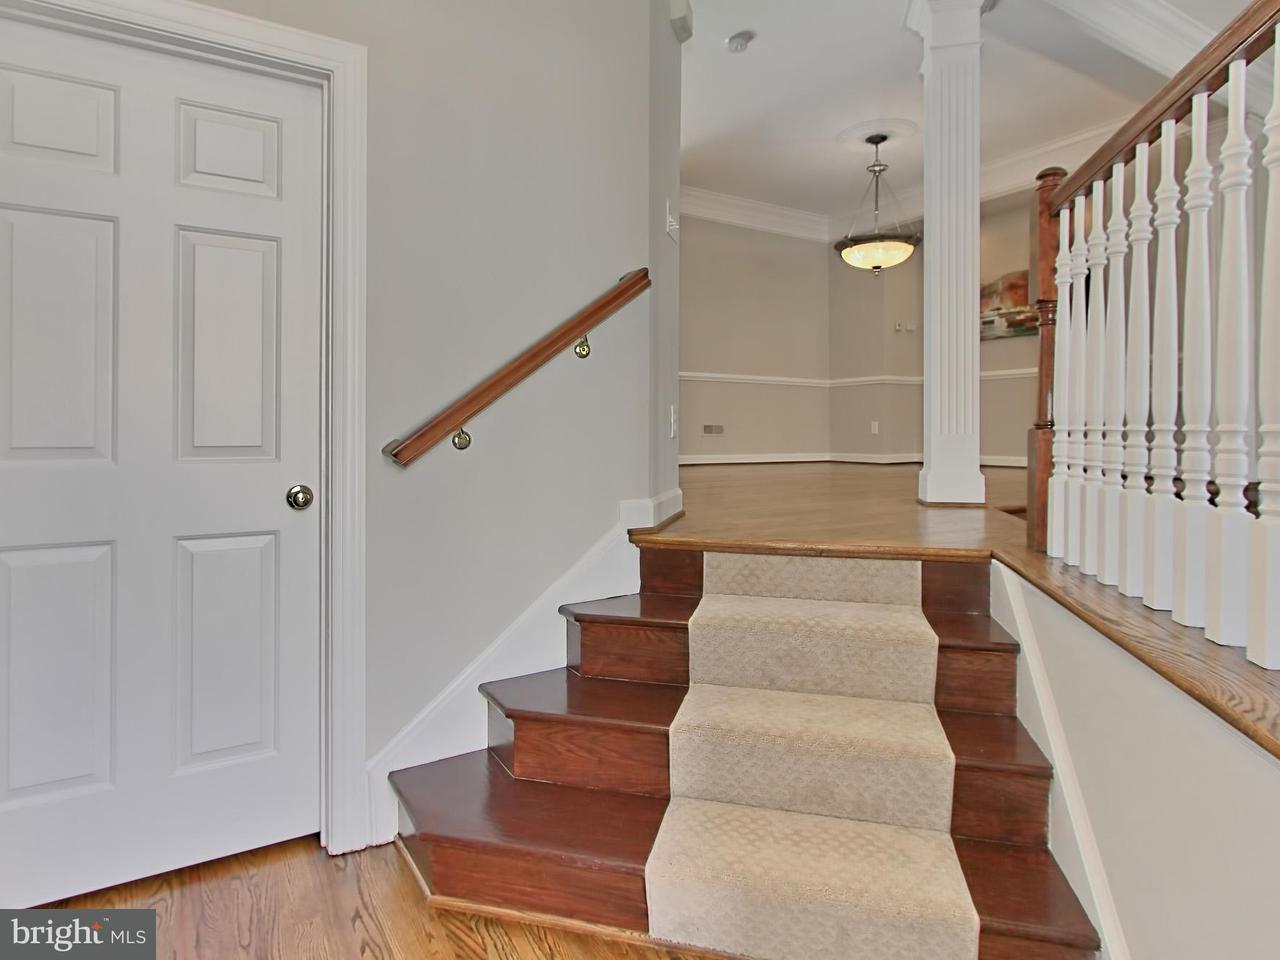 Townhouse for Sale at 262 MURTHA Street 262 MURTHA Street Alexandria, Virginia 22304 United States